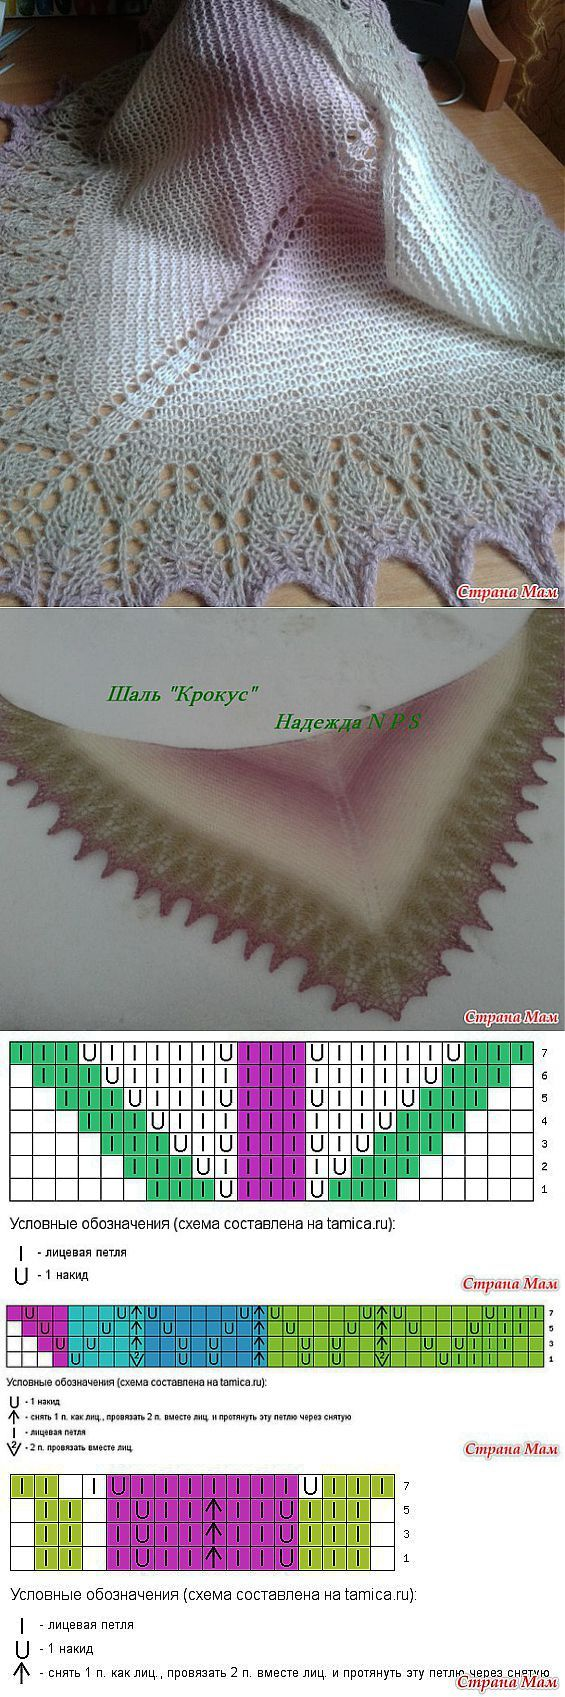 Pretty Lace Shawl pattern from Russia. Моя первая мини- шаль 'Крокус': Дневник группы 'ЗАО Шалунья' - Страна Мам